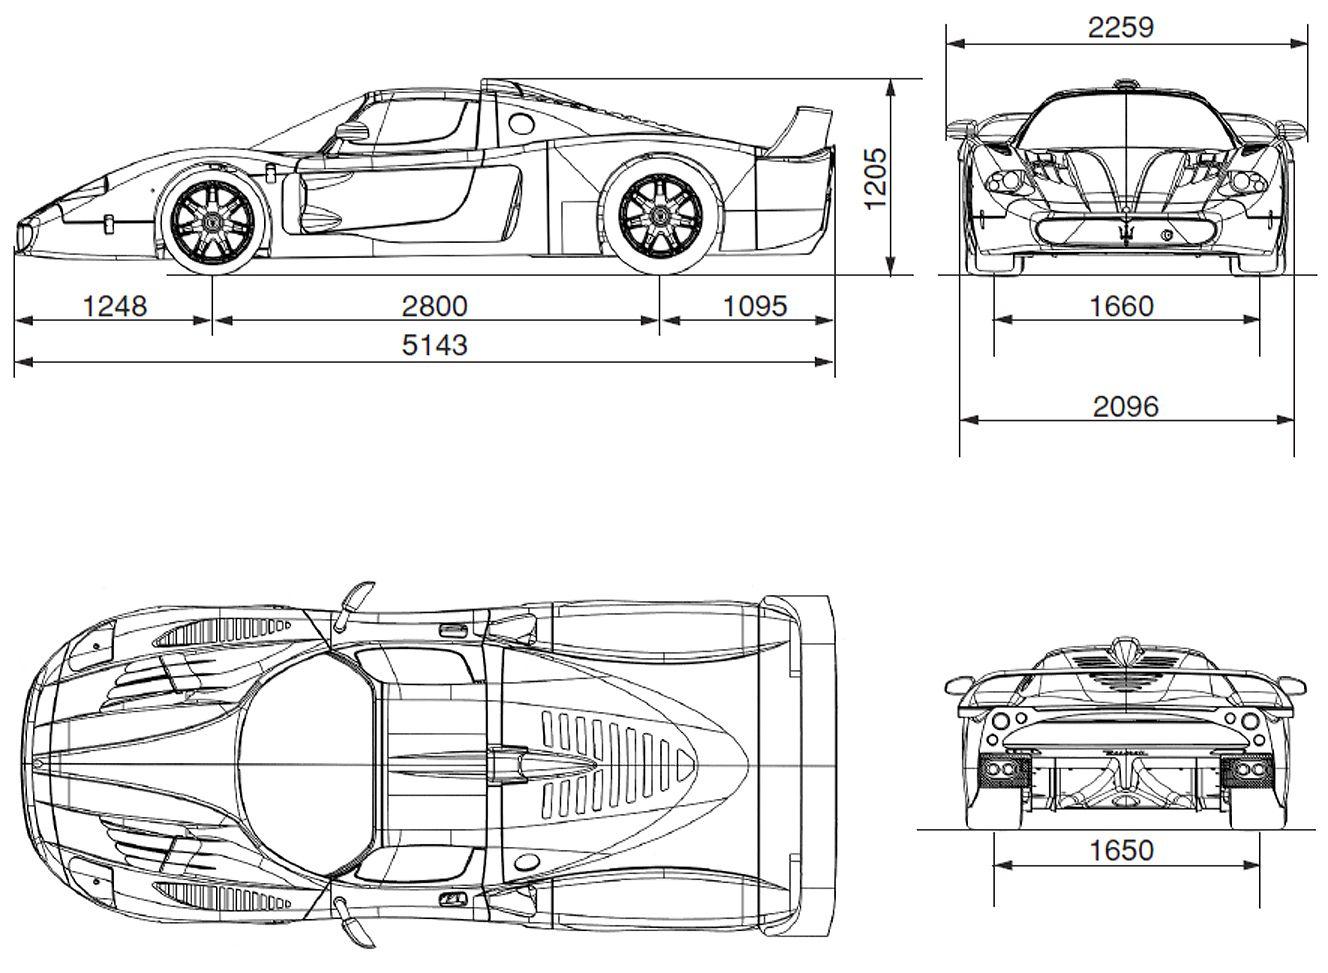 Maserati MC12 blueprint | Blueprints | Pinterest | Maserati, Cars ...